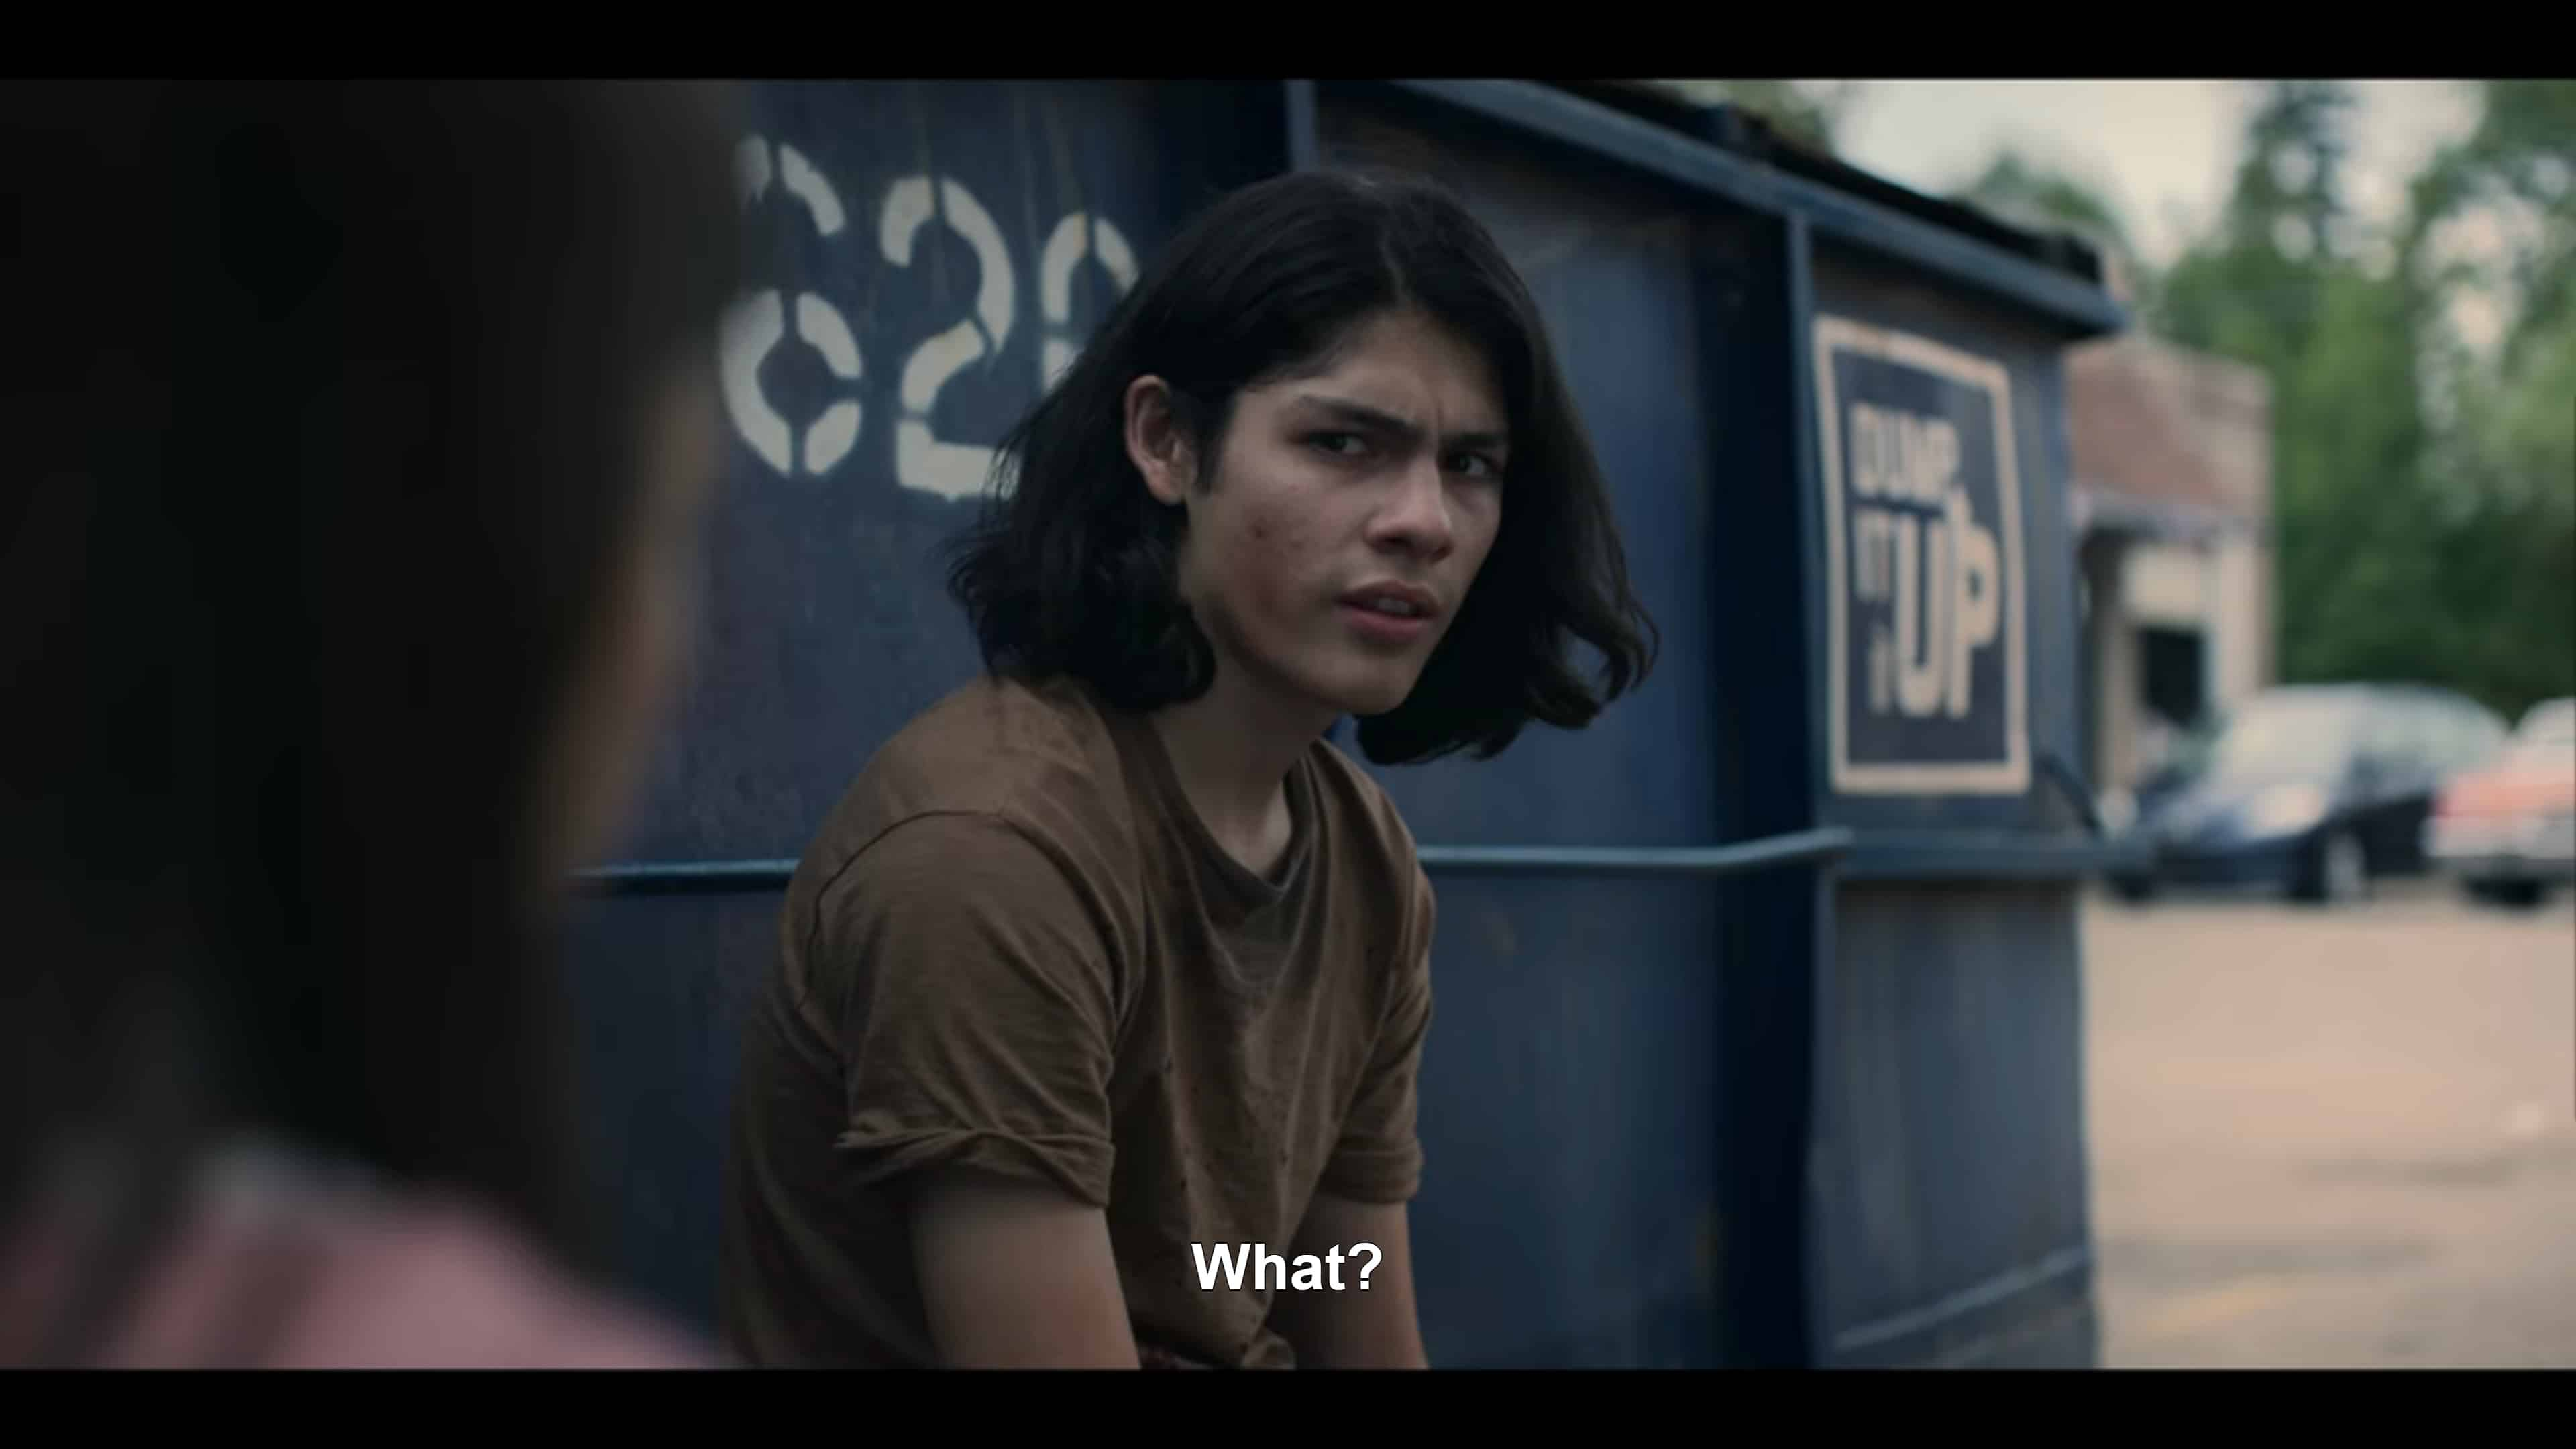 Noah (Lucius Hoyos) talking to Matilda about his ex-girlfriend